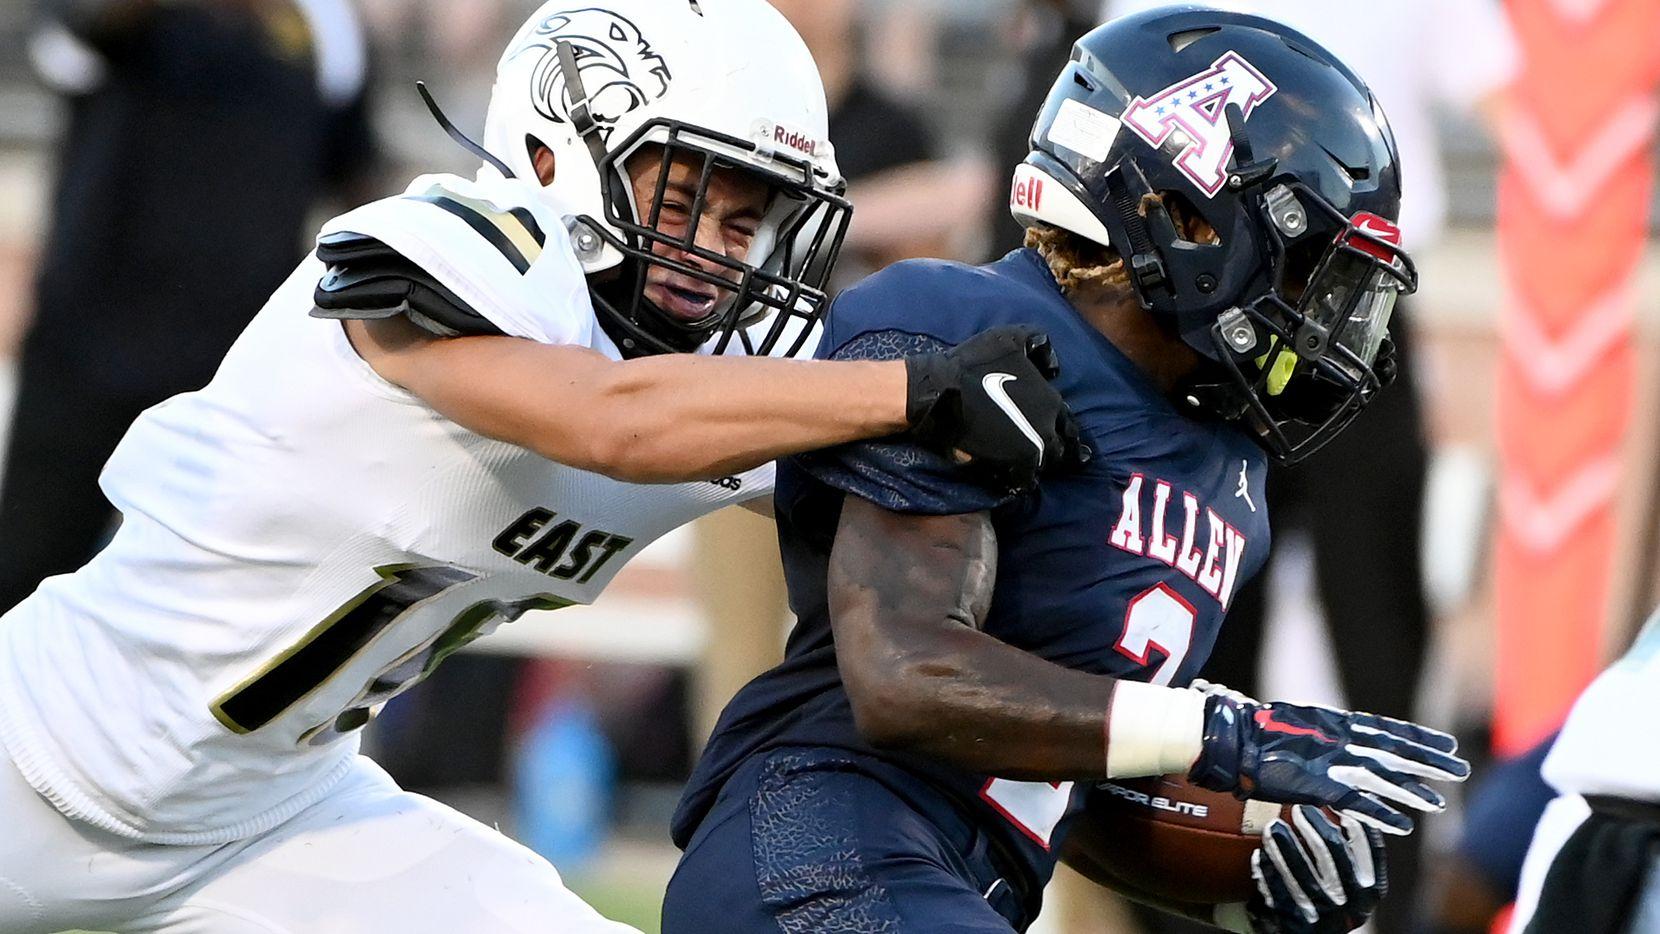 Plano East's Holden Stokes tackles Allen's Jaylen Jenkins (2) in the first half during a high school football game between Plano East and Allen, Friday, Aug. 27, 2021, in Allen, Texas.